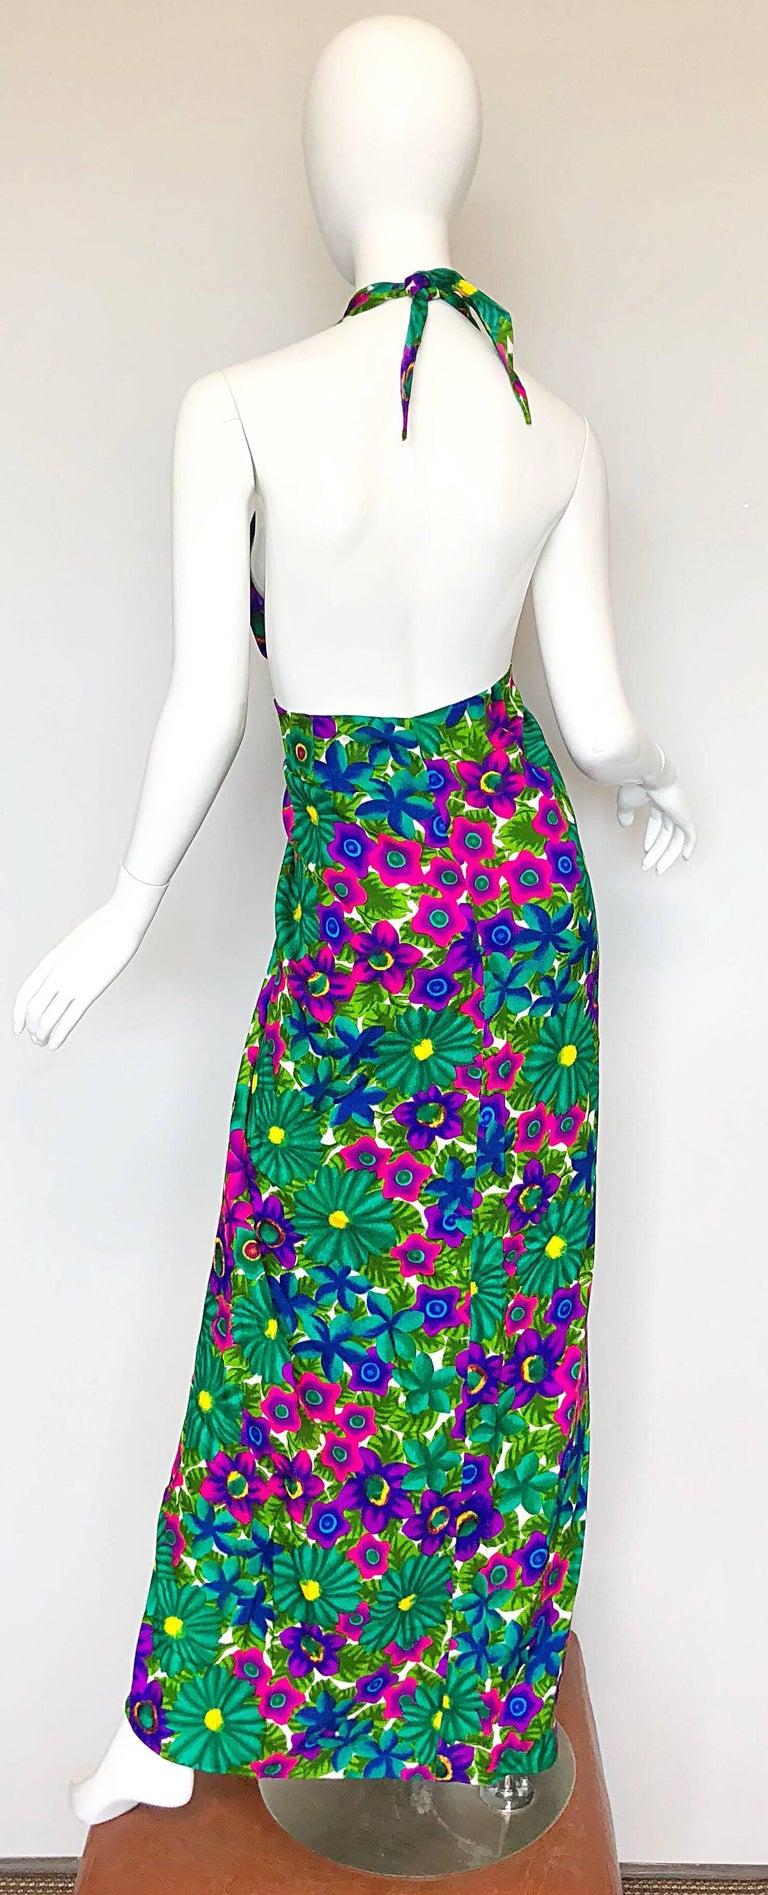 Women's 1970s Pomare Hawaiian Vintage Colorful Tropical Print Halter Wrap 70s Maxi Dress For Sale